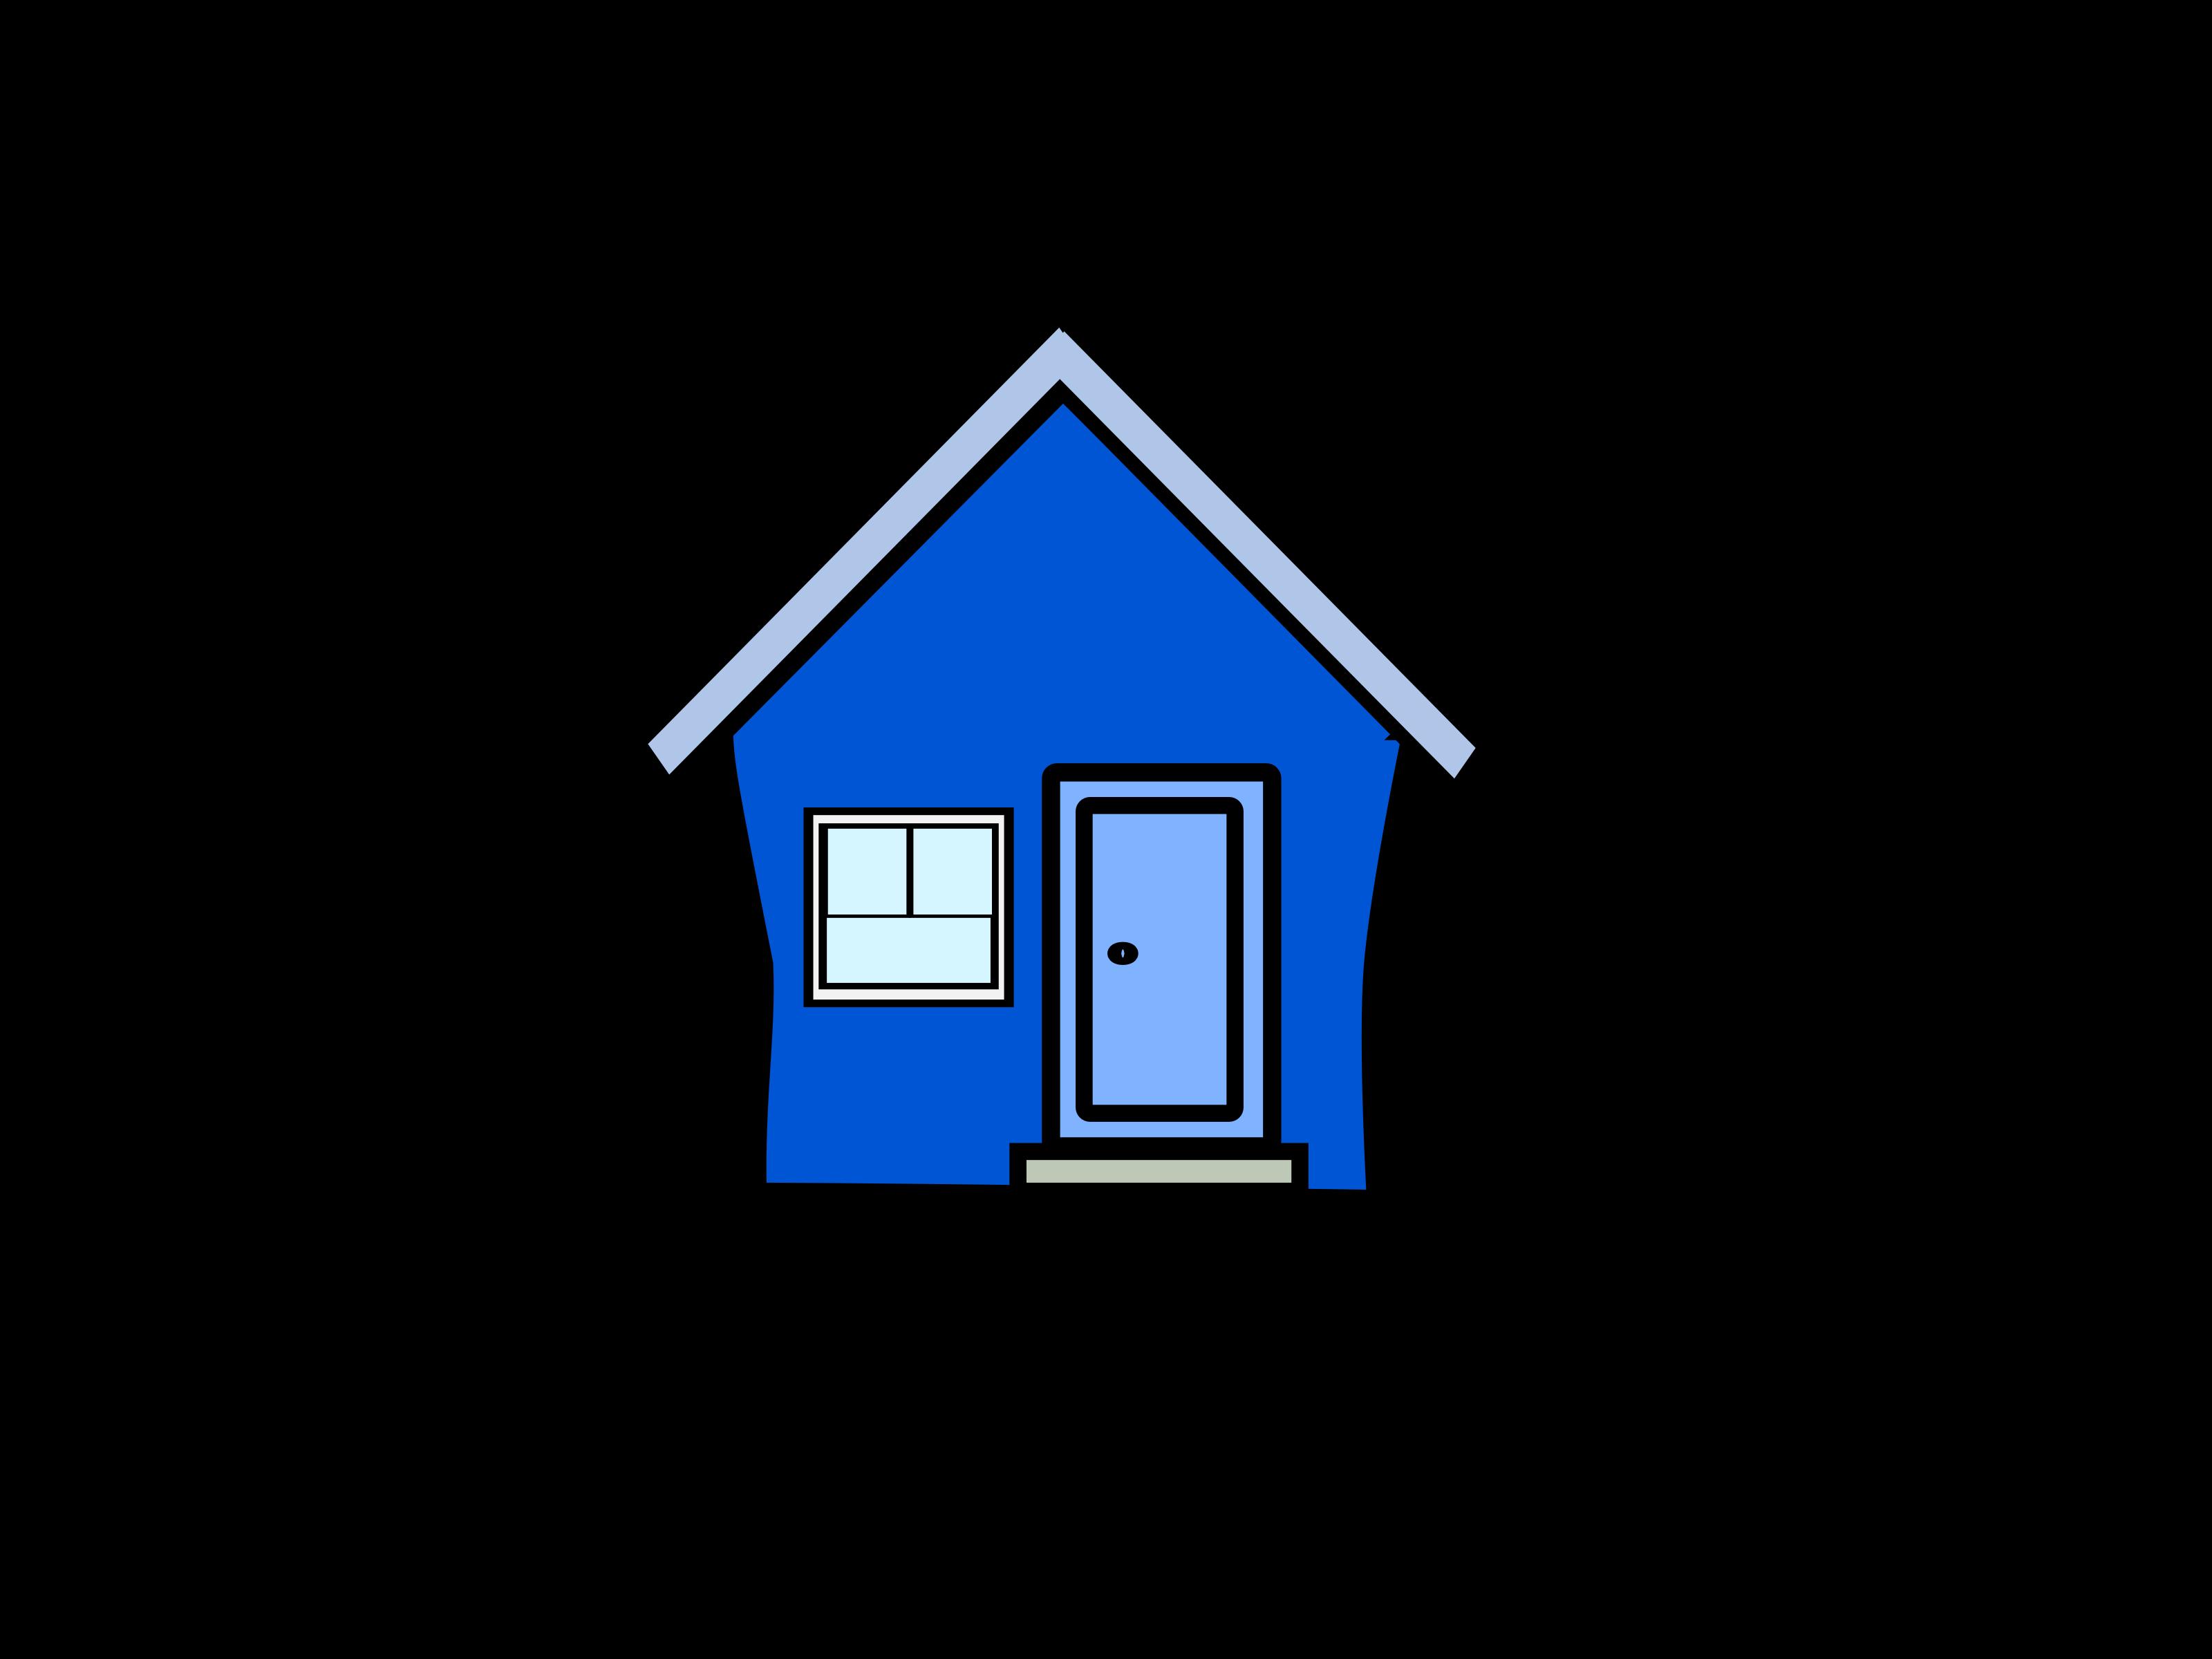 clip art blue house - photo #35